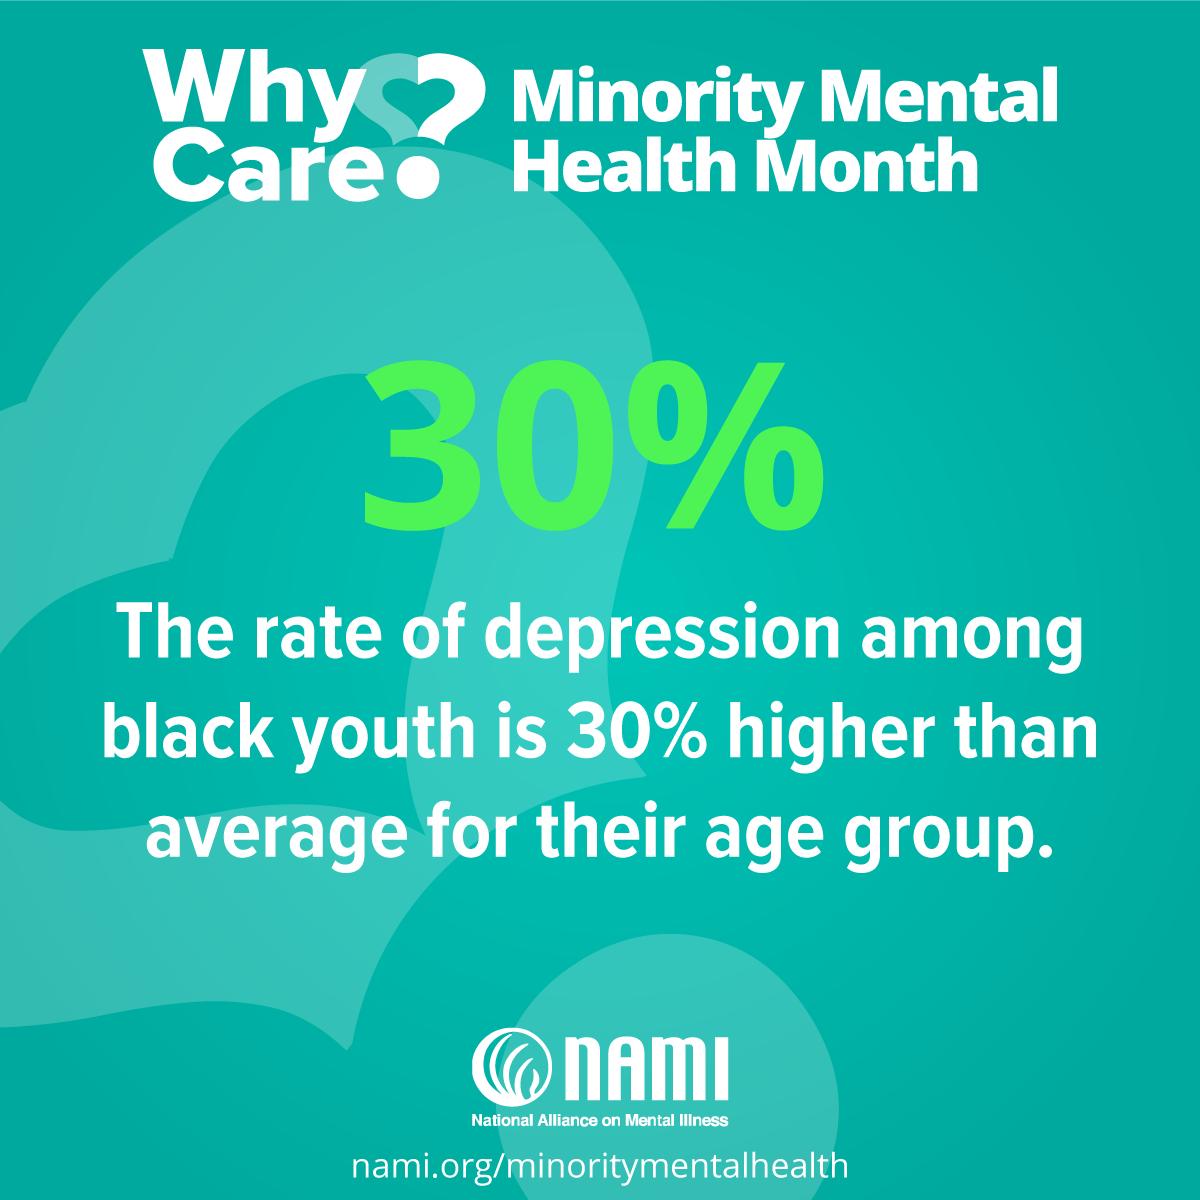 whycare-mmham-Instagram-stat-blackdepression.png